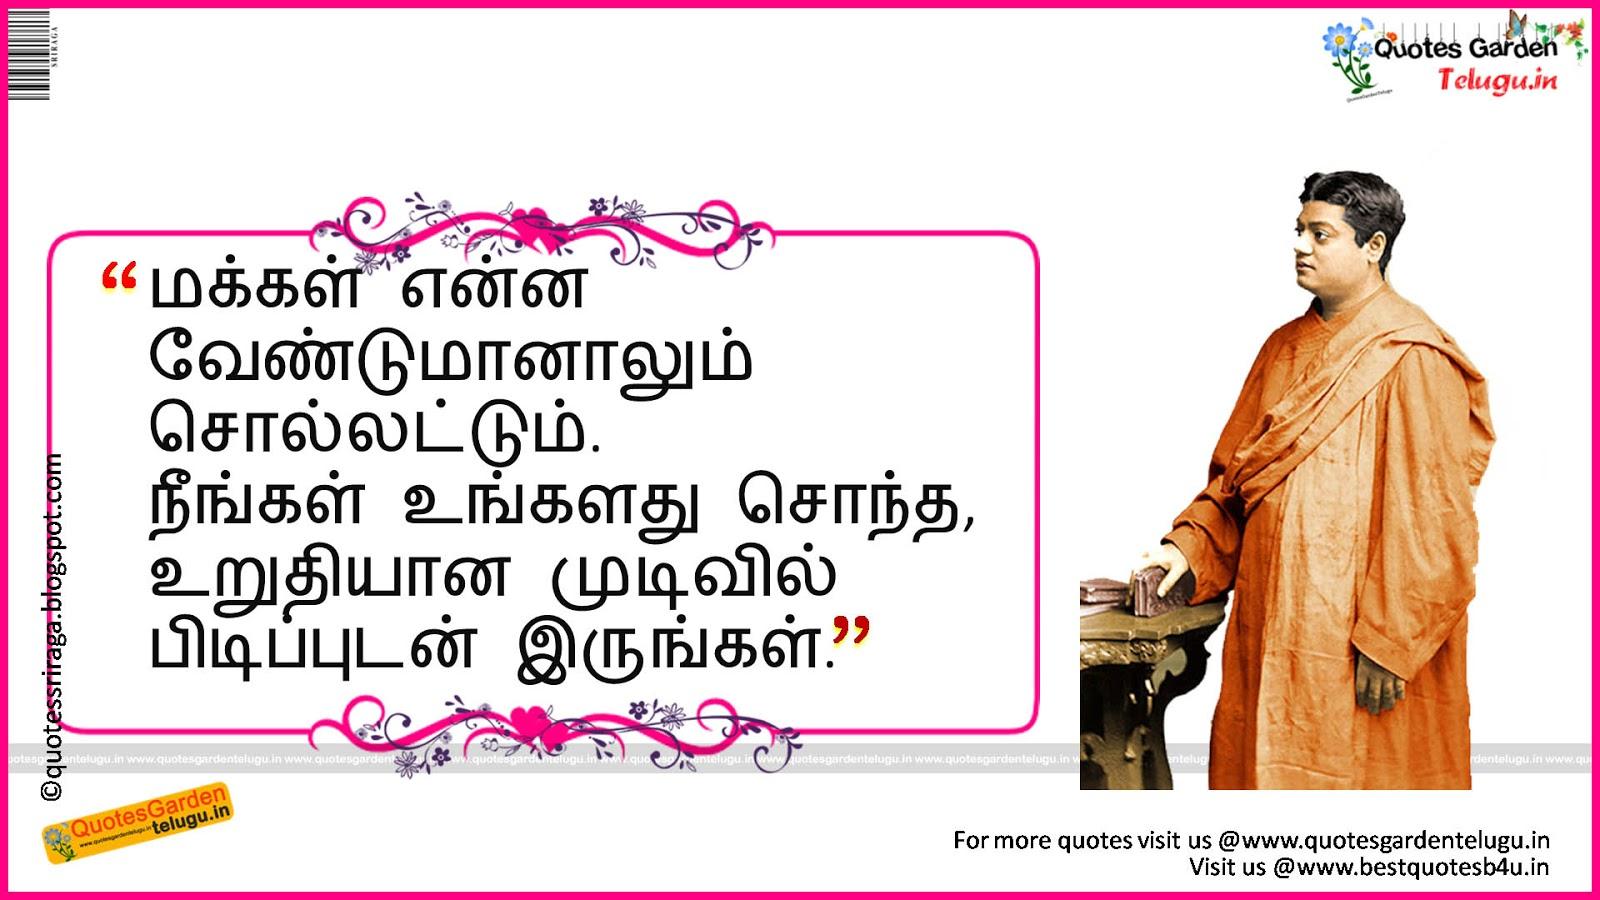 Tamil Inspirational Quotes Wallpaper New Latest Swami Vivekananda Golden Words In Tamil